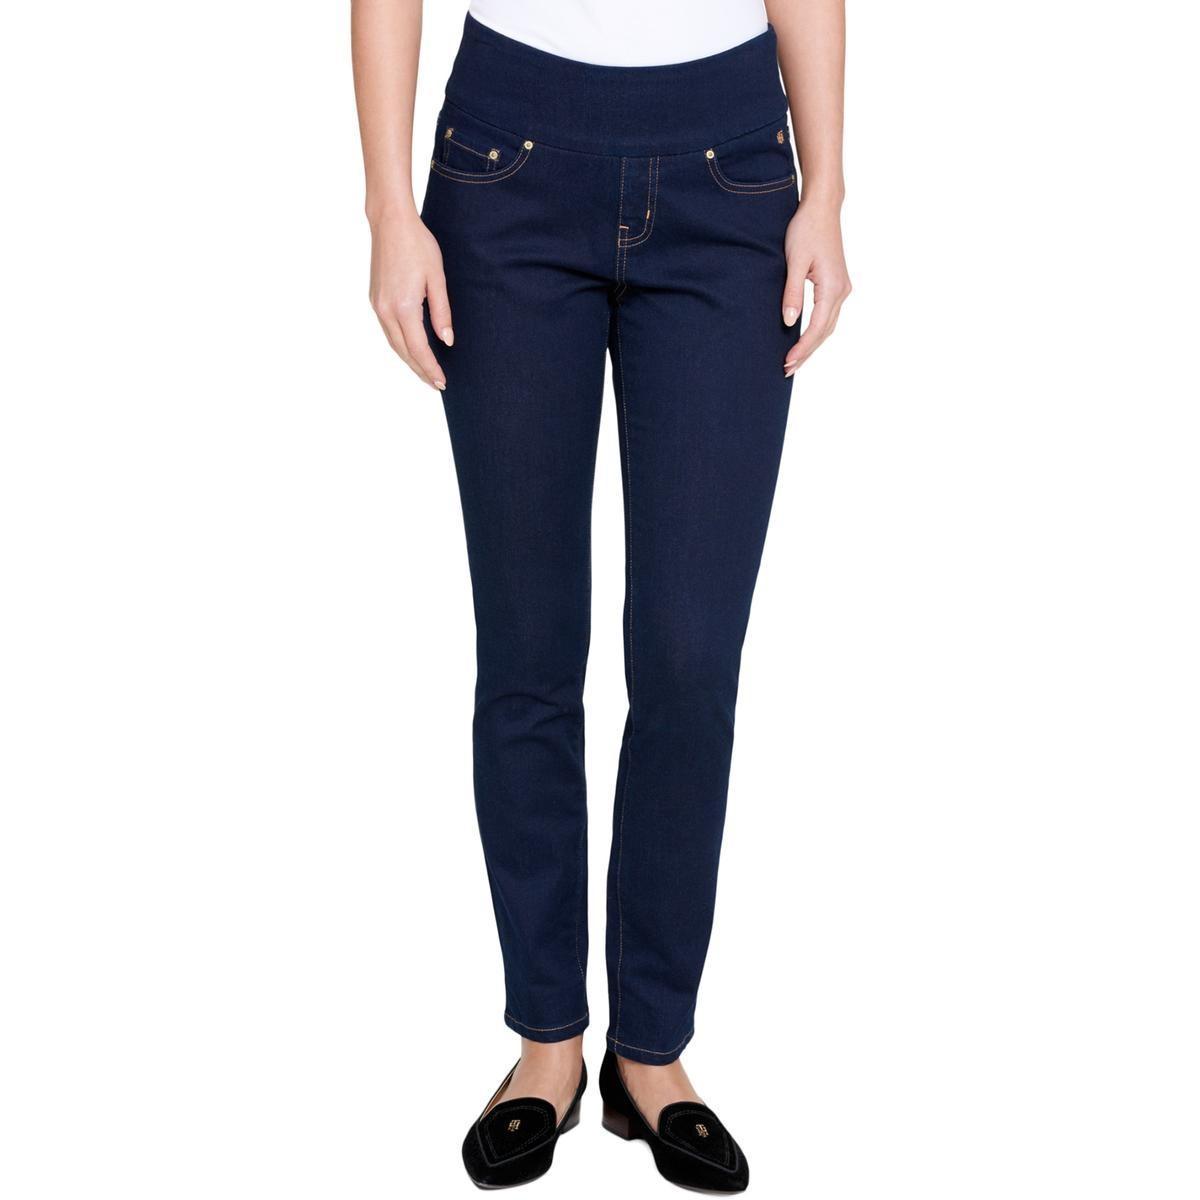 c313f5ca635 Lyst - Tommy Hilfiger Mid-rise Denim Straight Leg Jeans in Blue